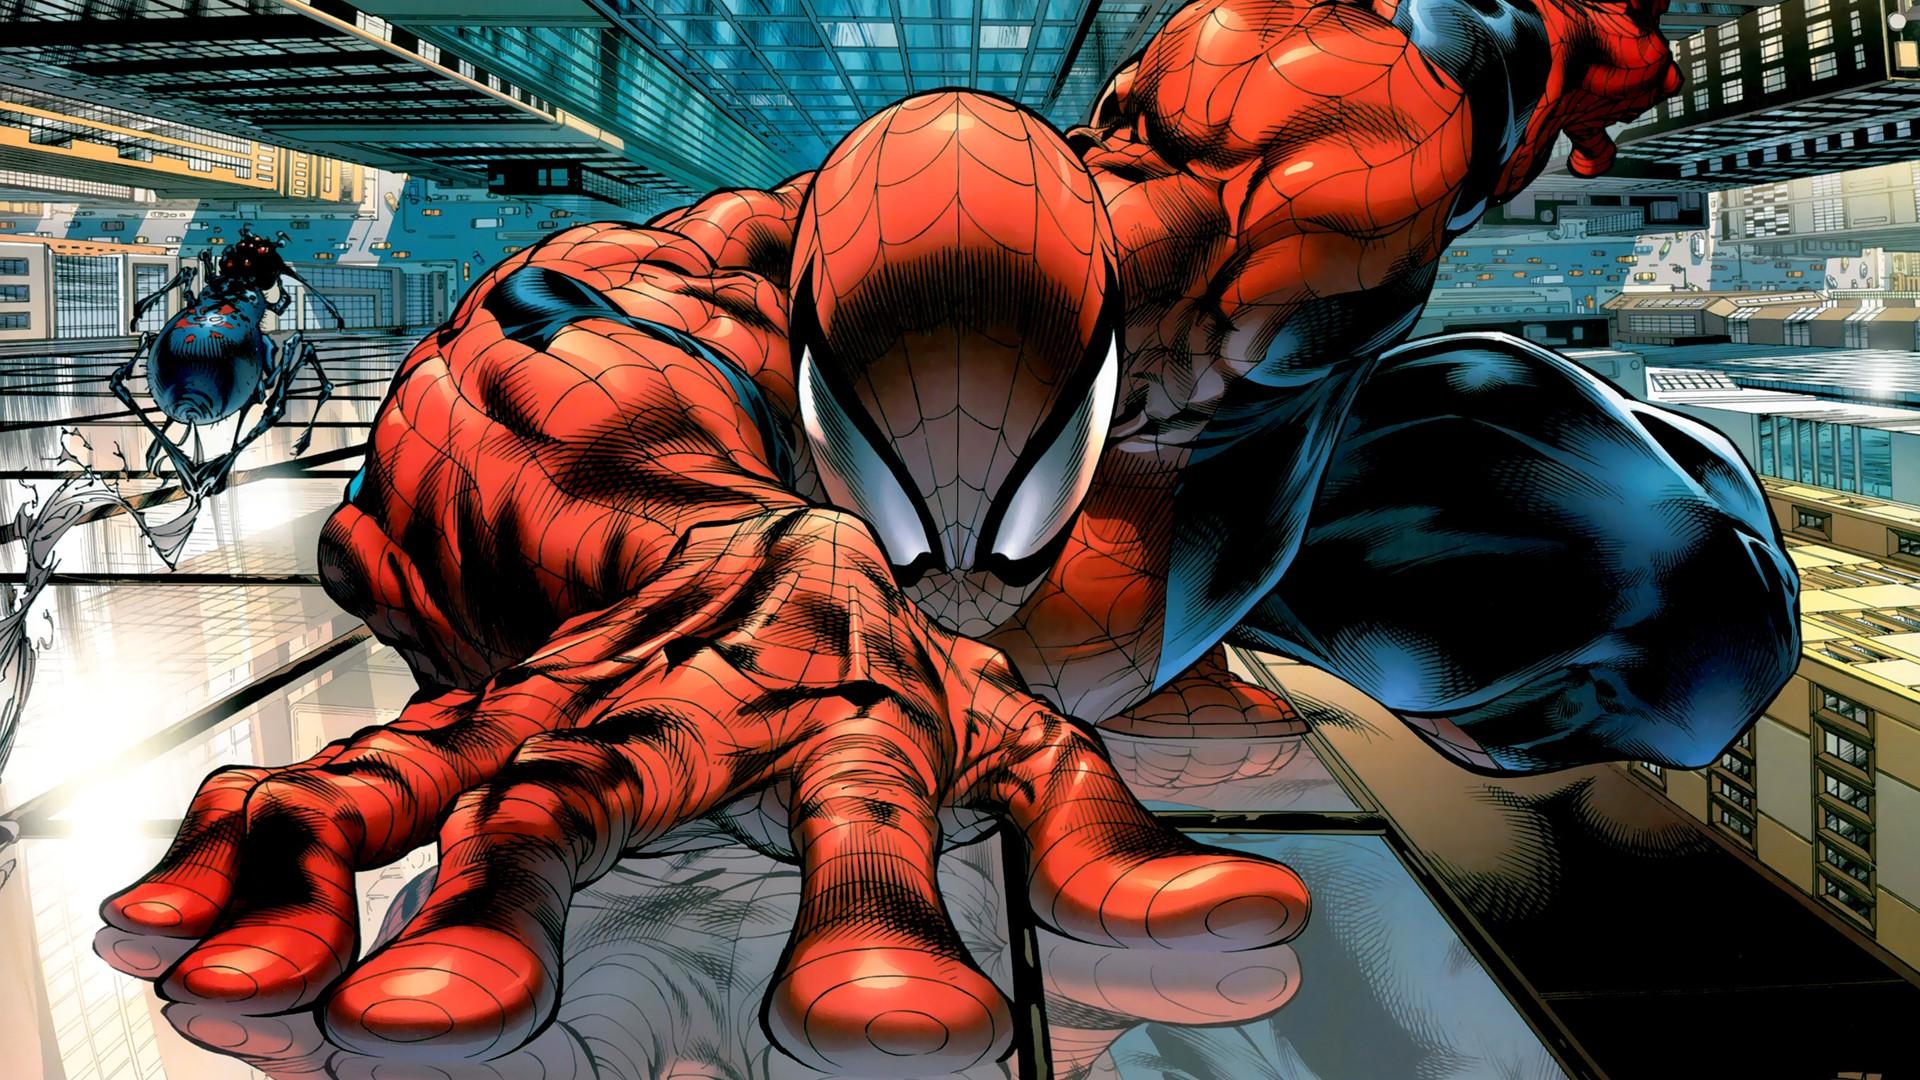 Beautiful Wallpaper Marvel Lizard - spider-man-comic-drawing-63  You Should Have_113615.jpg